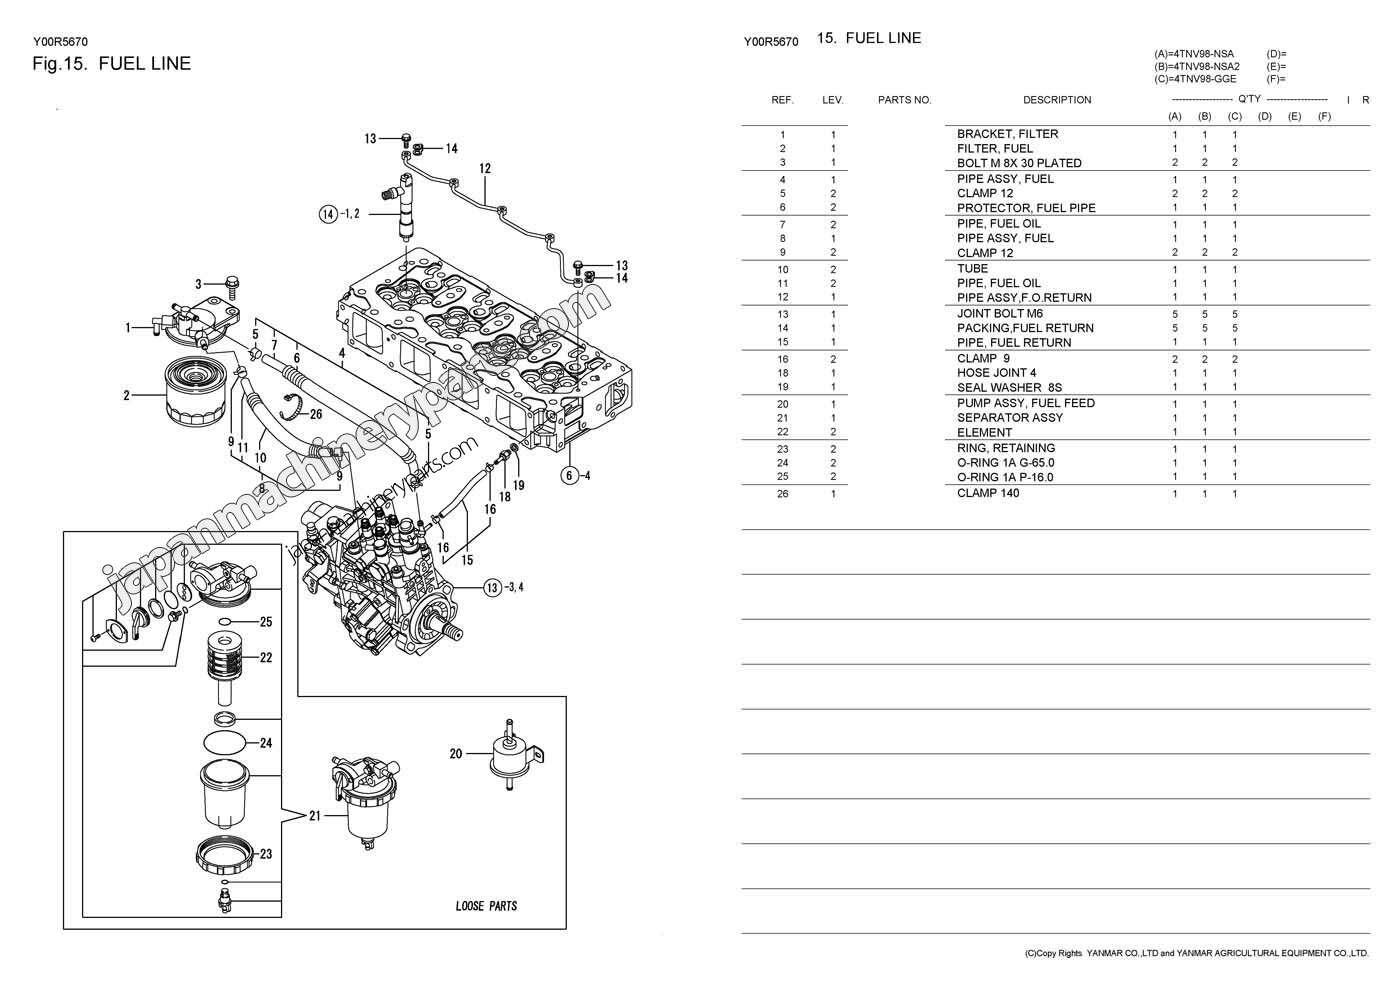 hight resolution of yanmar 4tnv wiring diagrams wiring diagram structure wiring diagram yanmar f 14